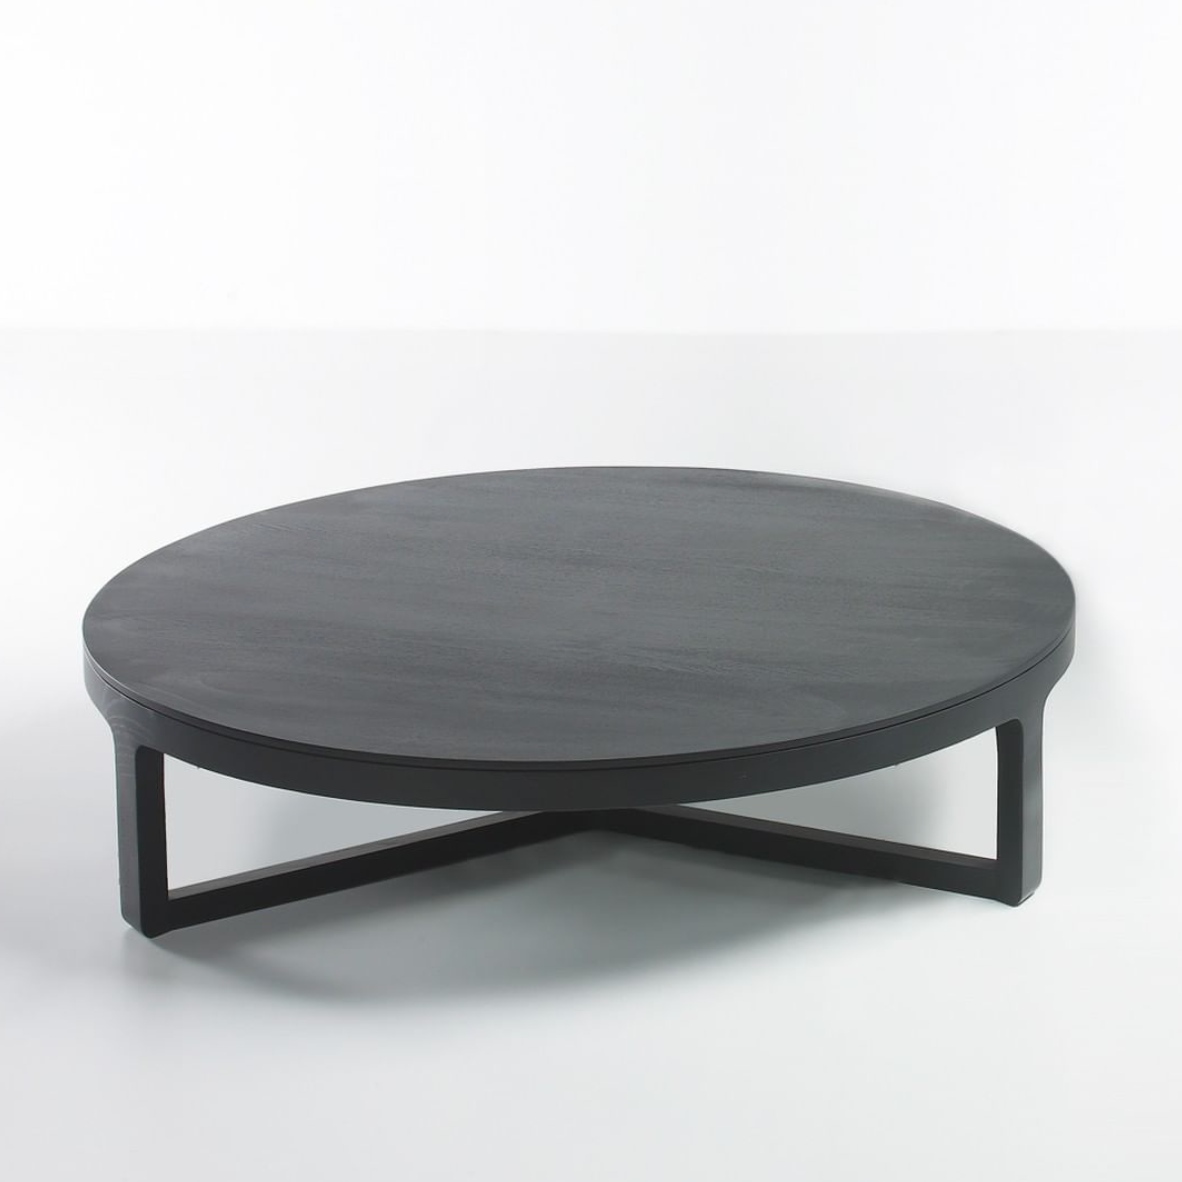 Ema Coffee Table Round Coffee Table Modern Round Wood Coffee Table Coffee Table [ 1182 x 1182 Pixel ]